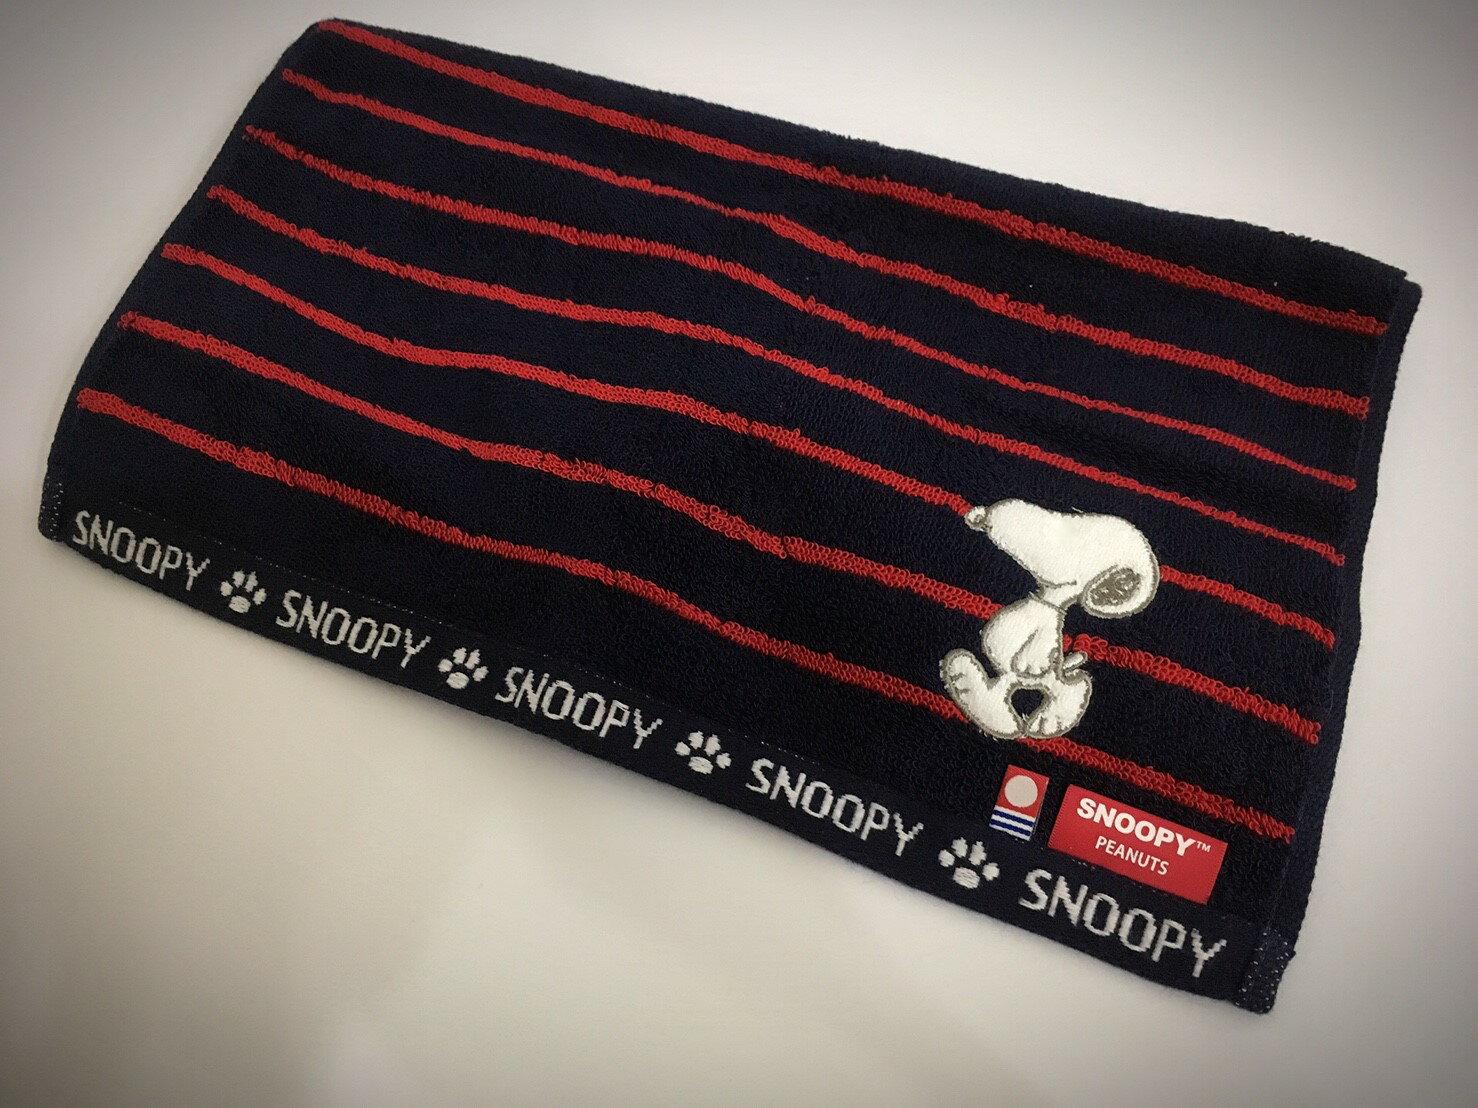 [iWork]日本製 SNOOPY 史努比長巾 黑紅條紋